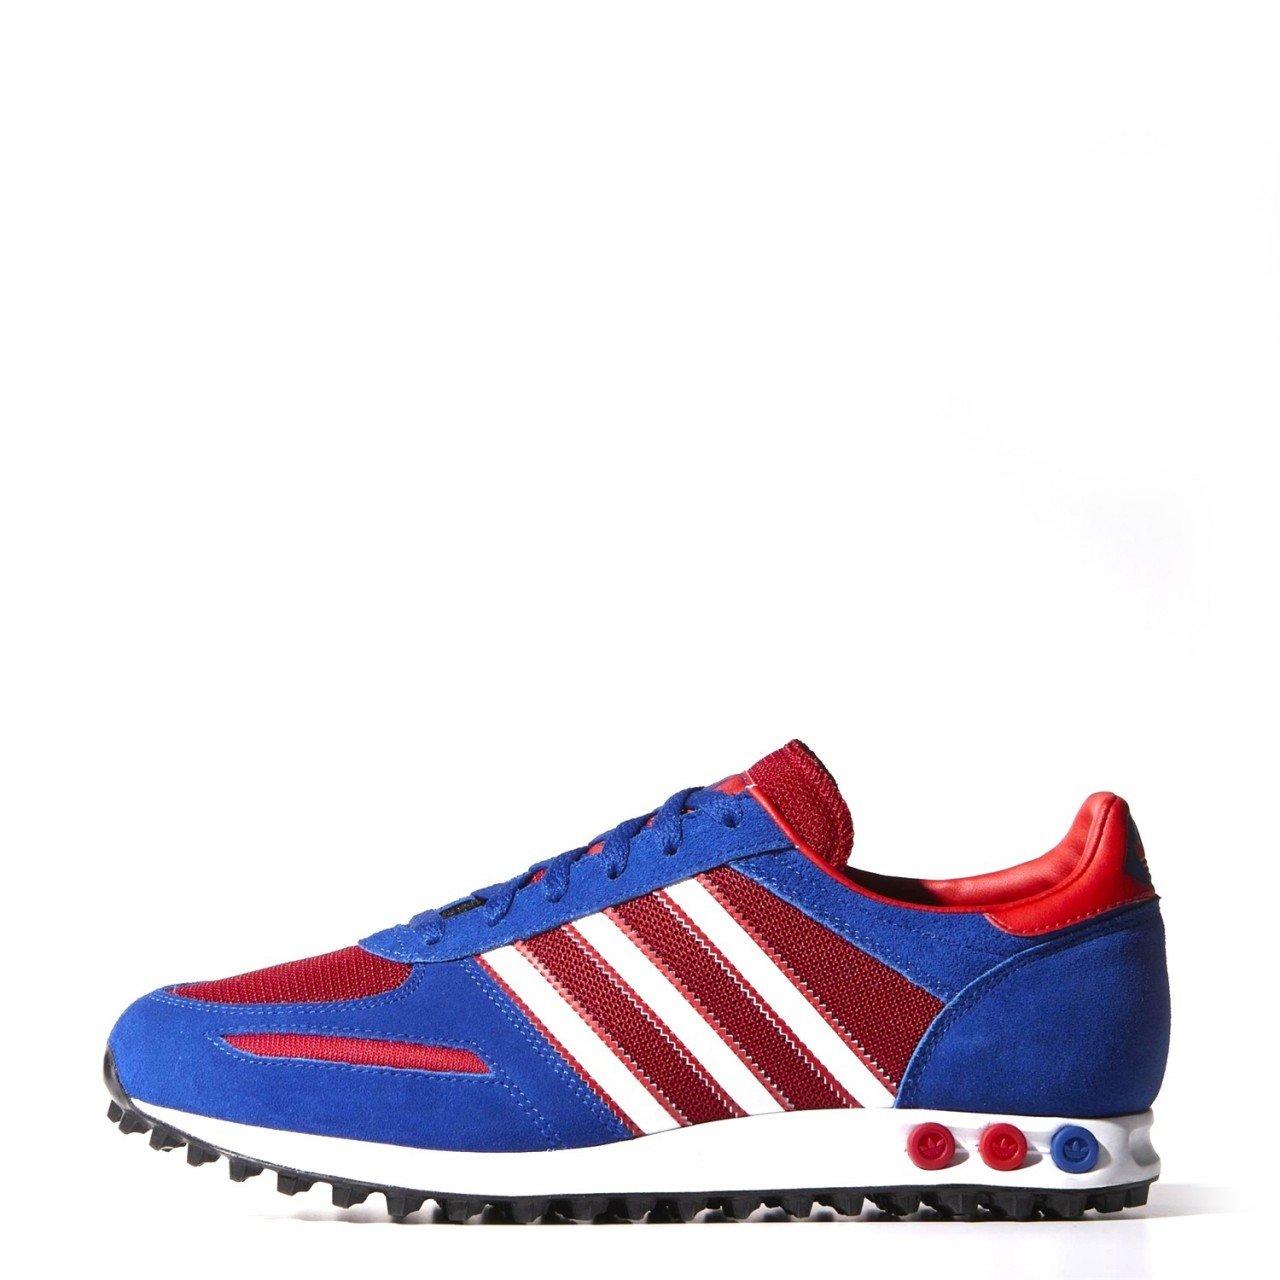 Amazon.it: Scarpe Adidas LA Trainer Rosse